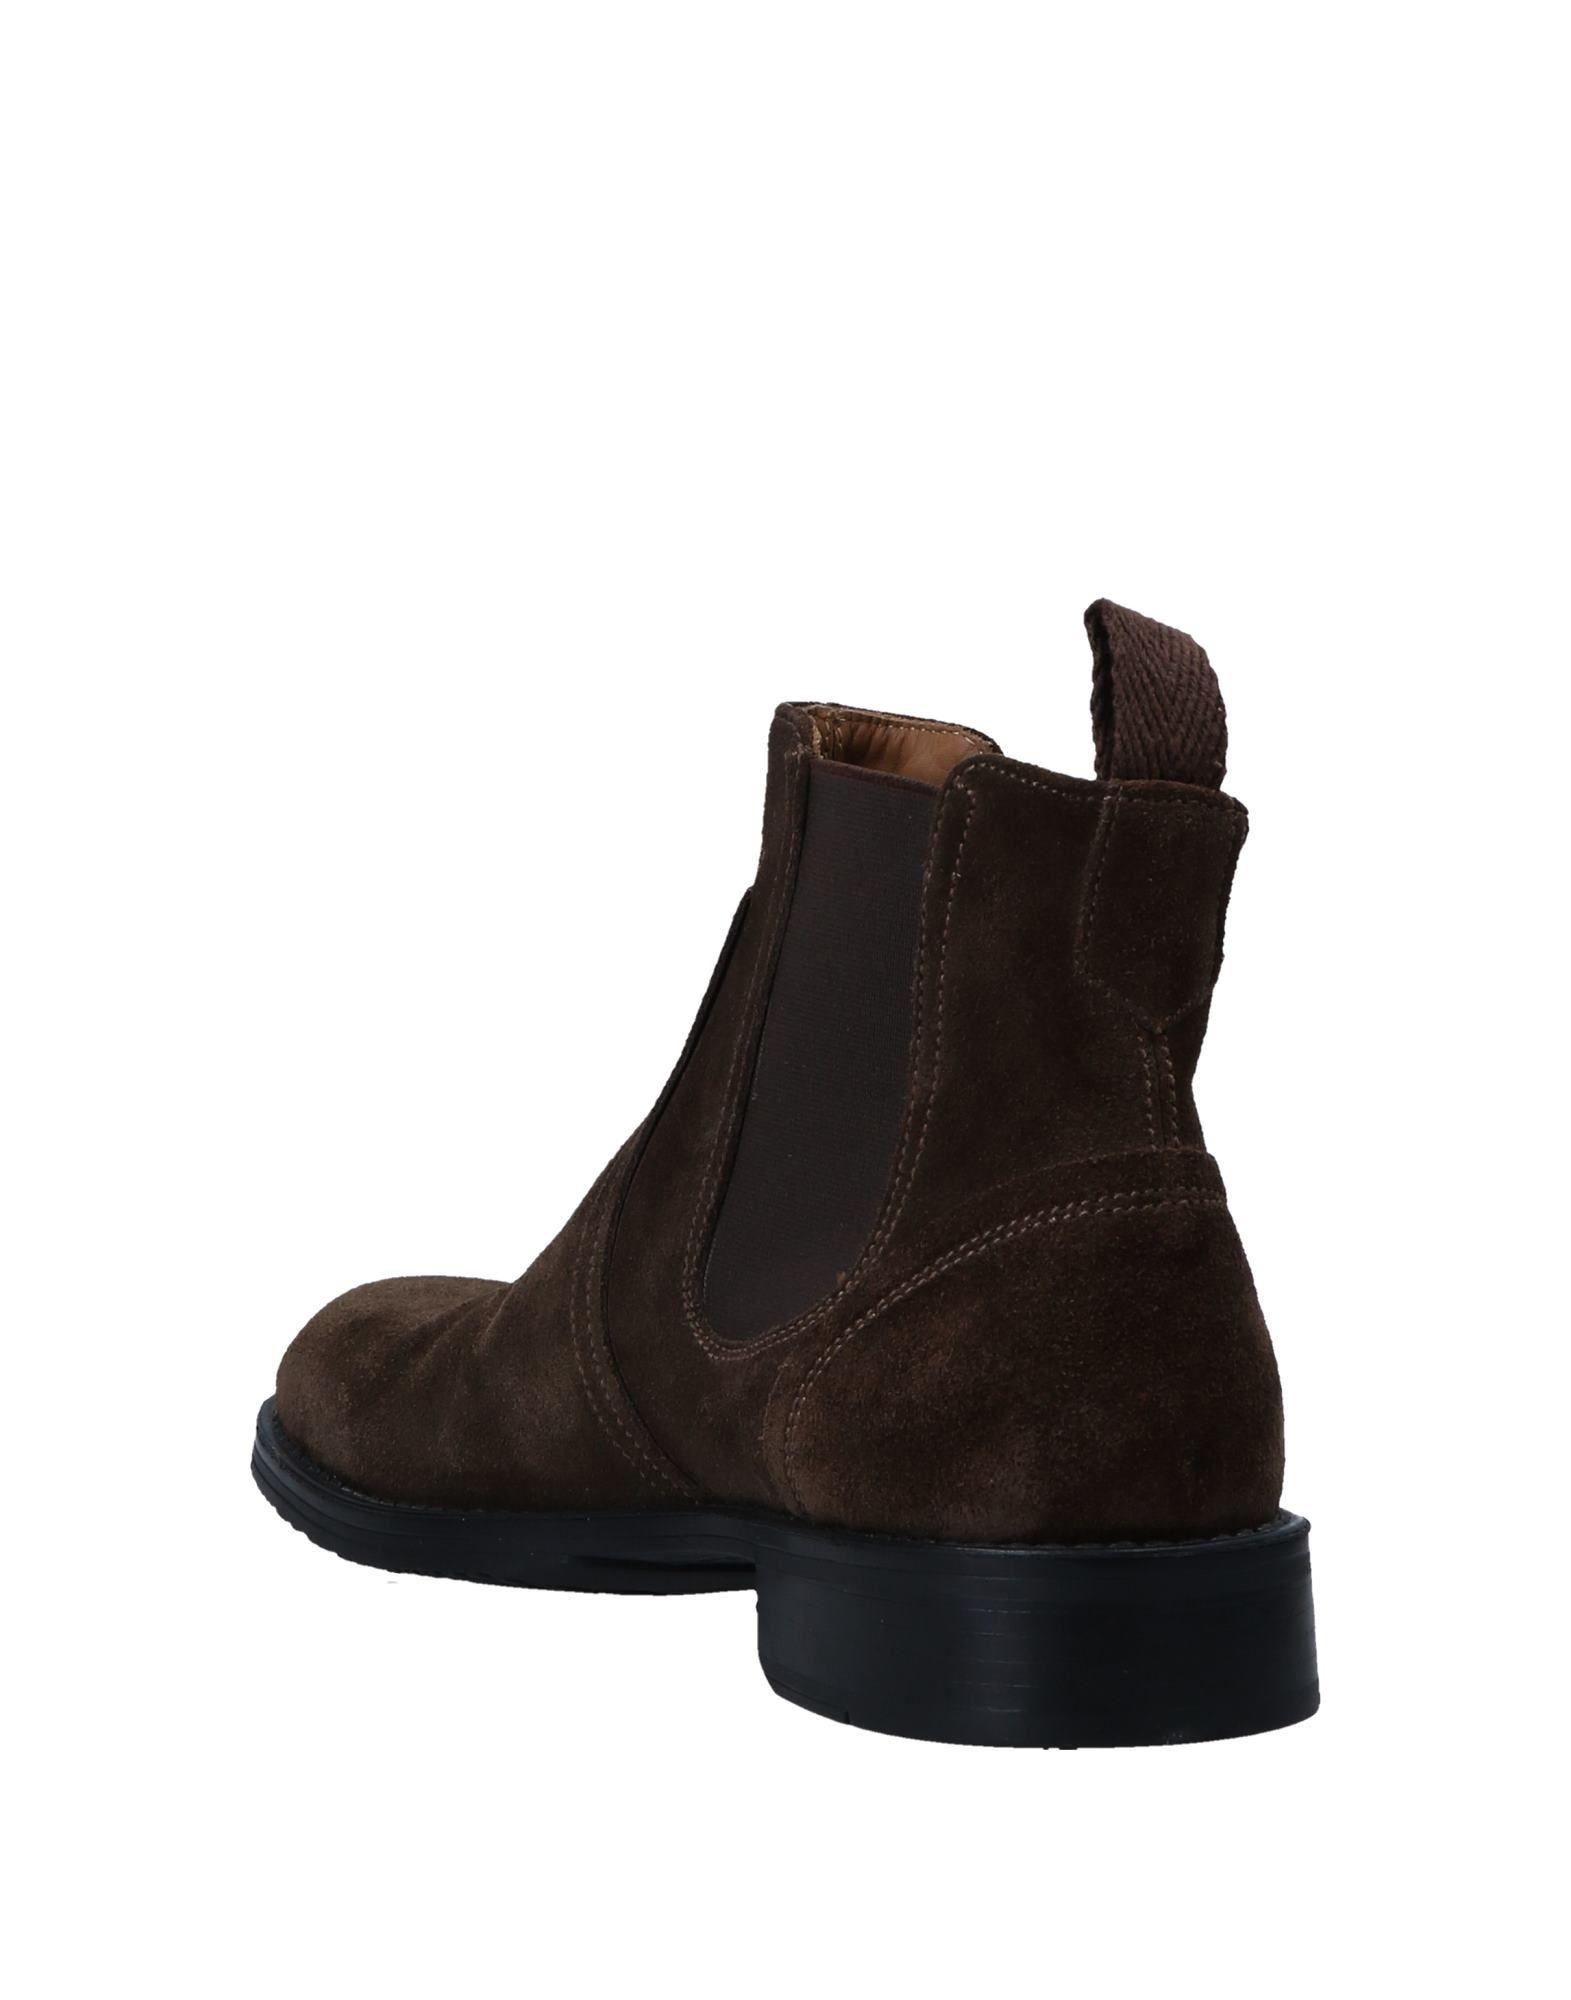 Rabatt echte Schuhe Morandi Stiefelette 11554773CX Herren  11554773CX Stiefelette 5e352a